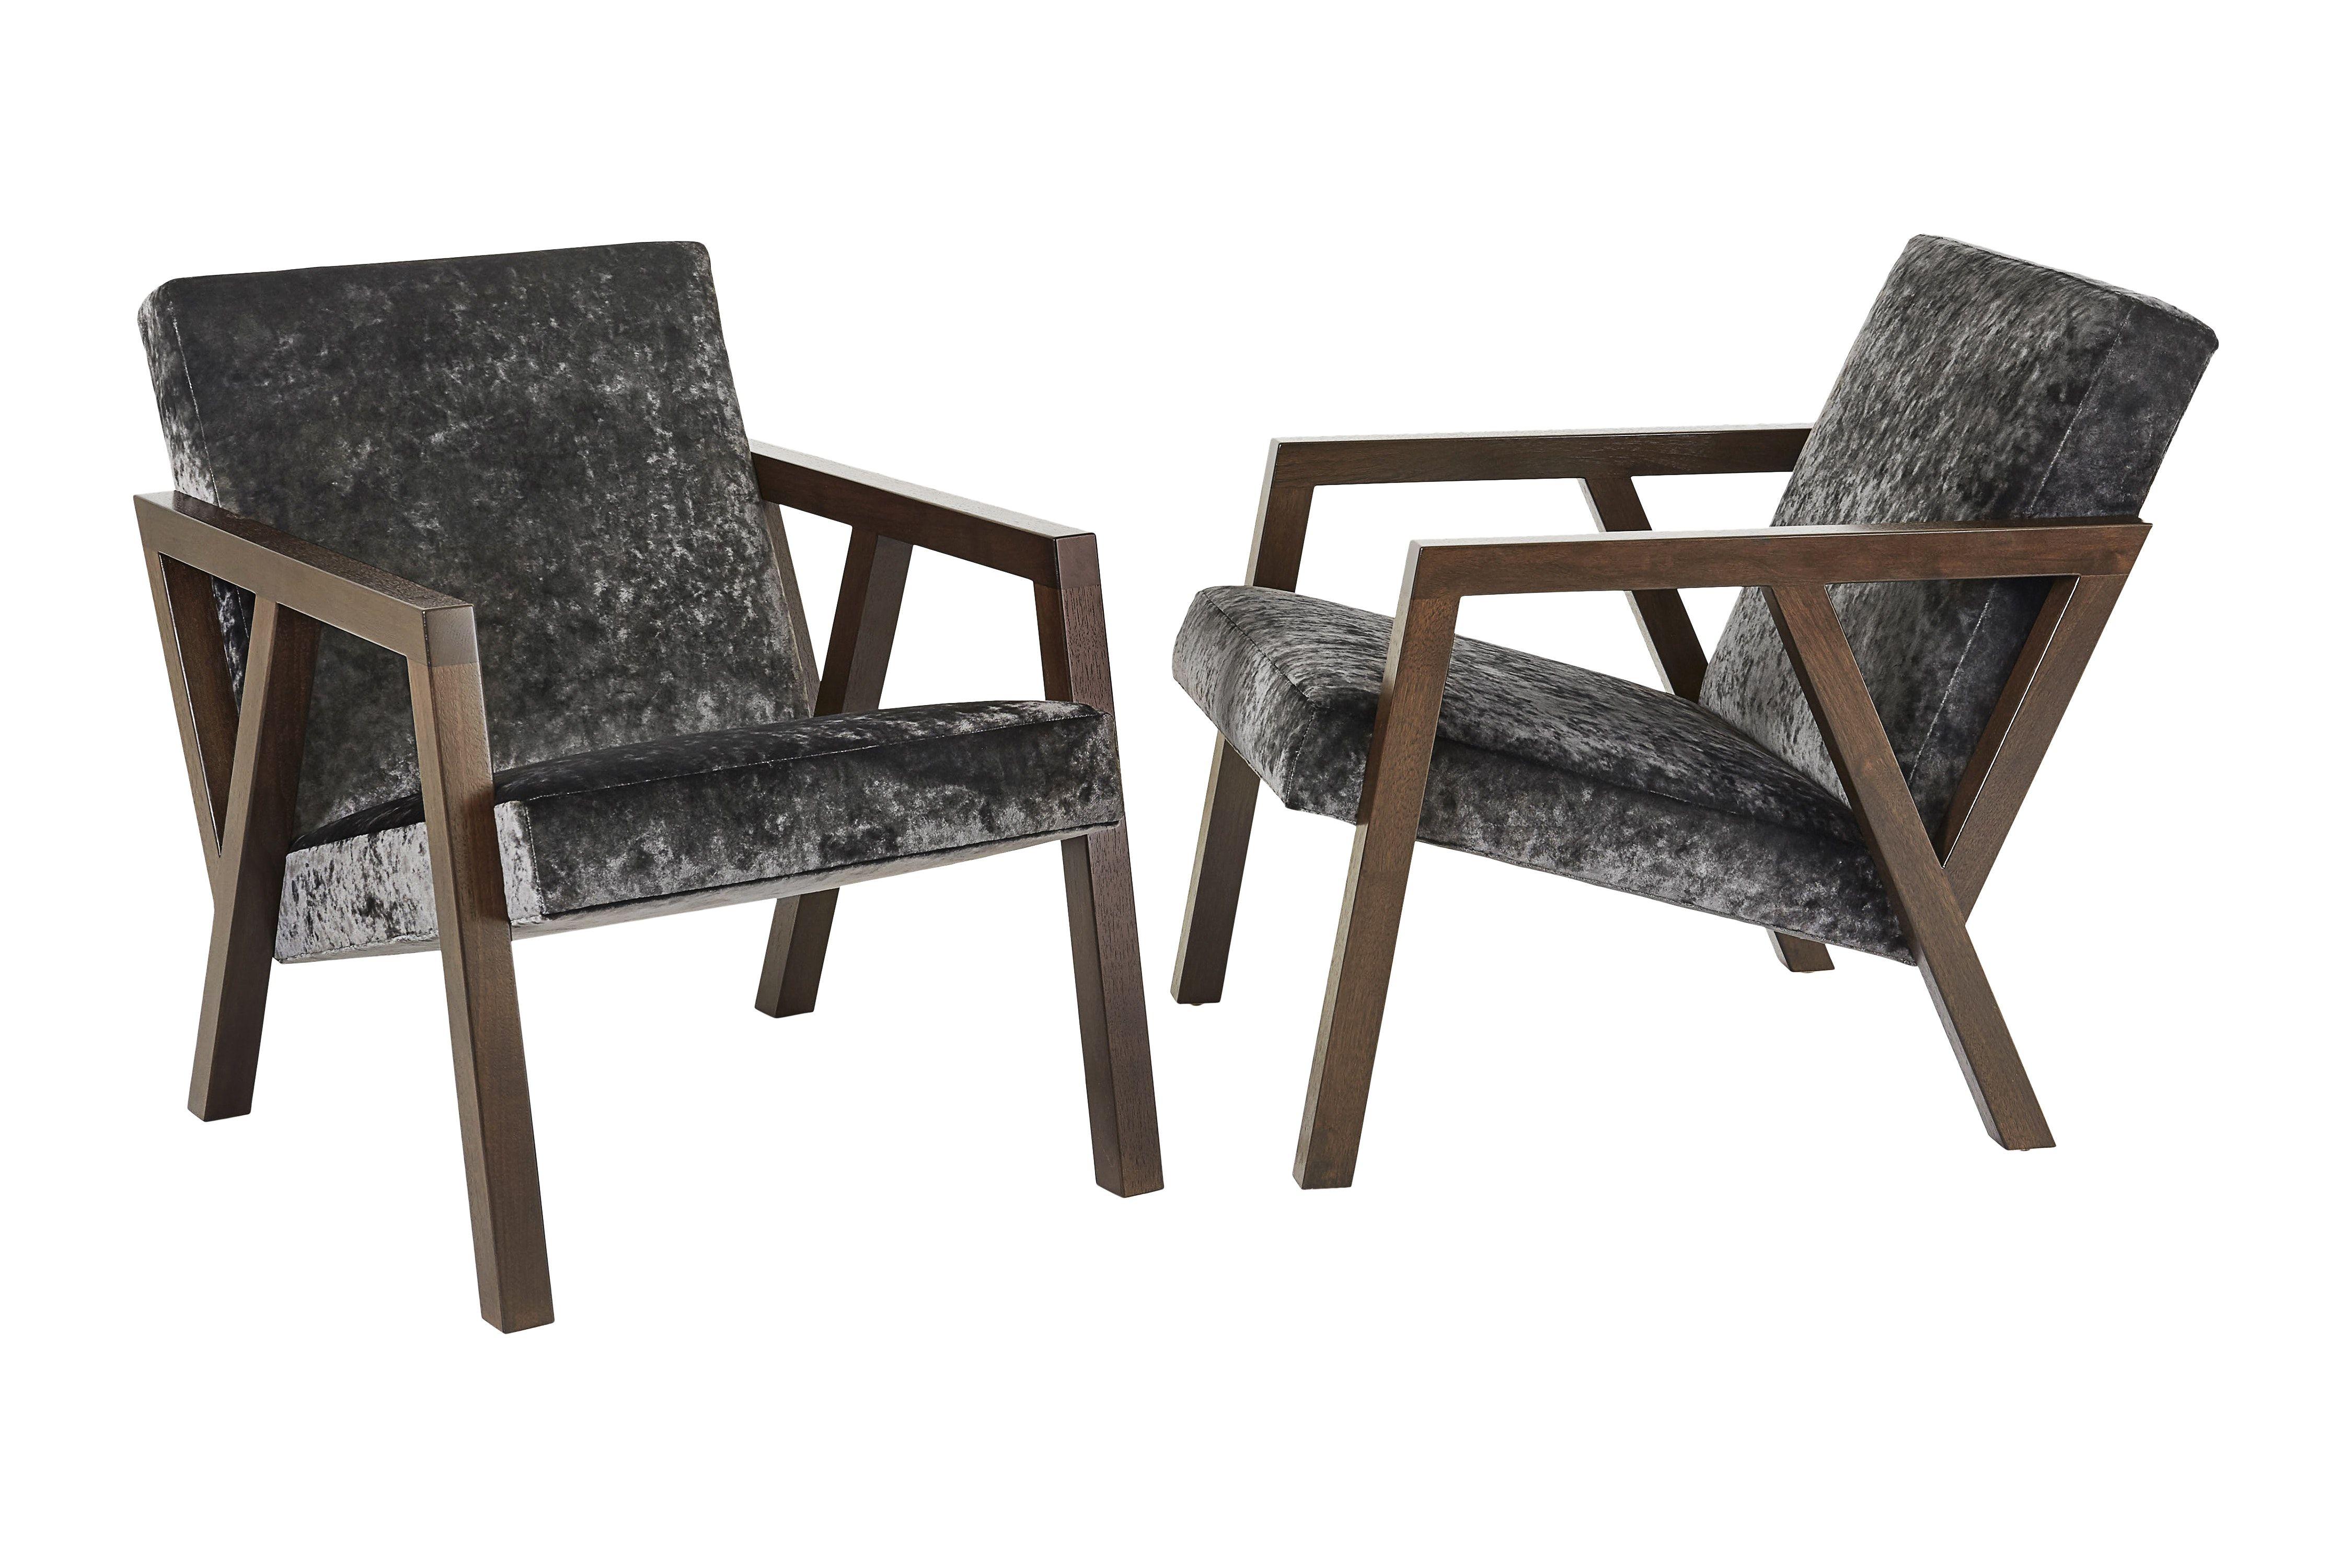 Moda chair buy naula price on request